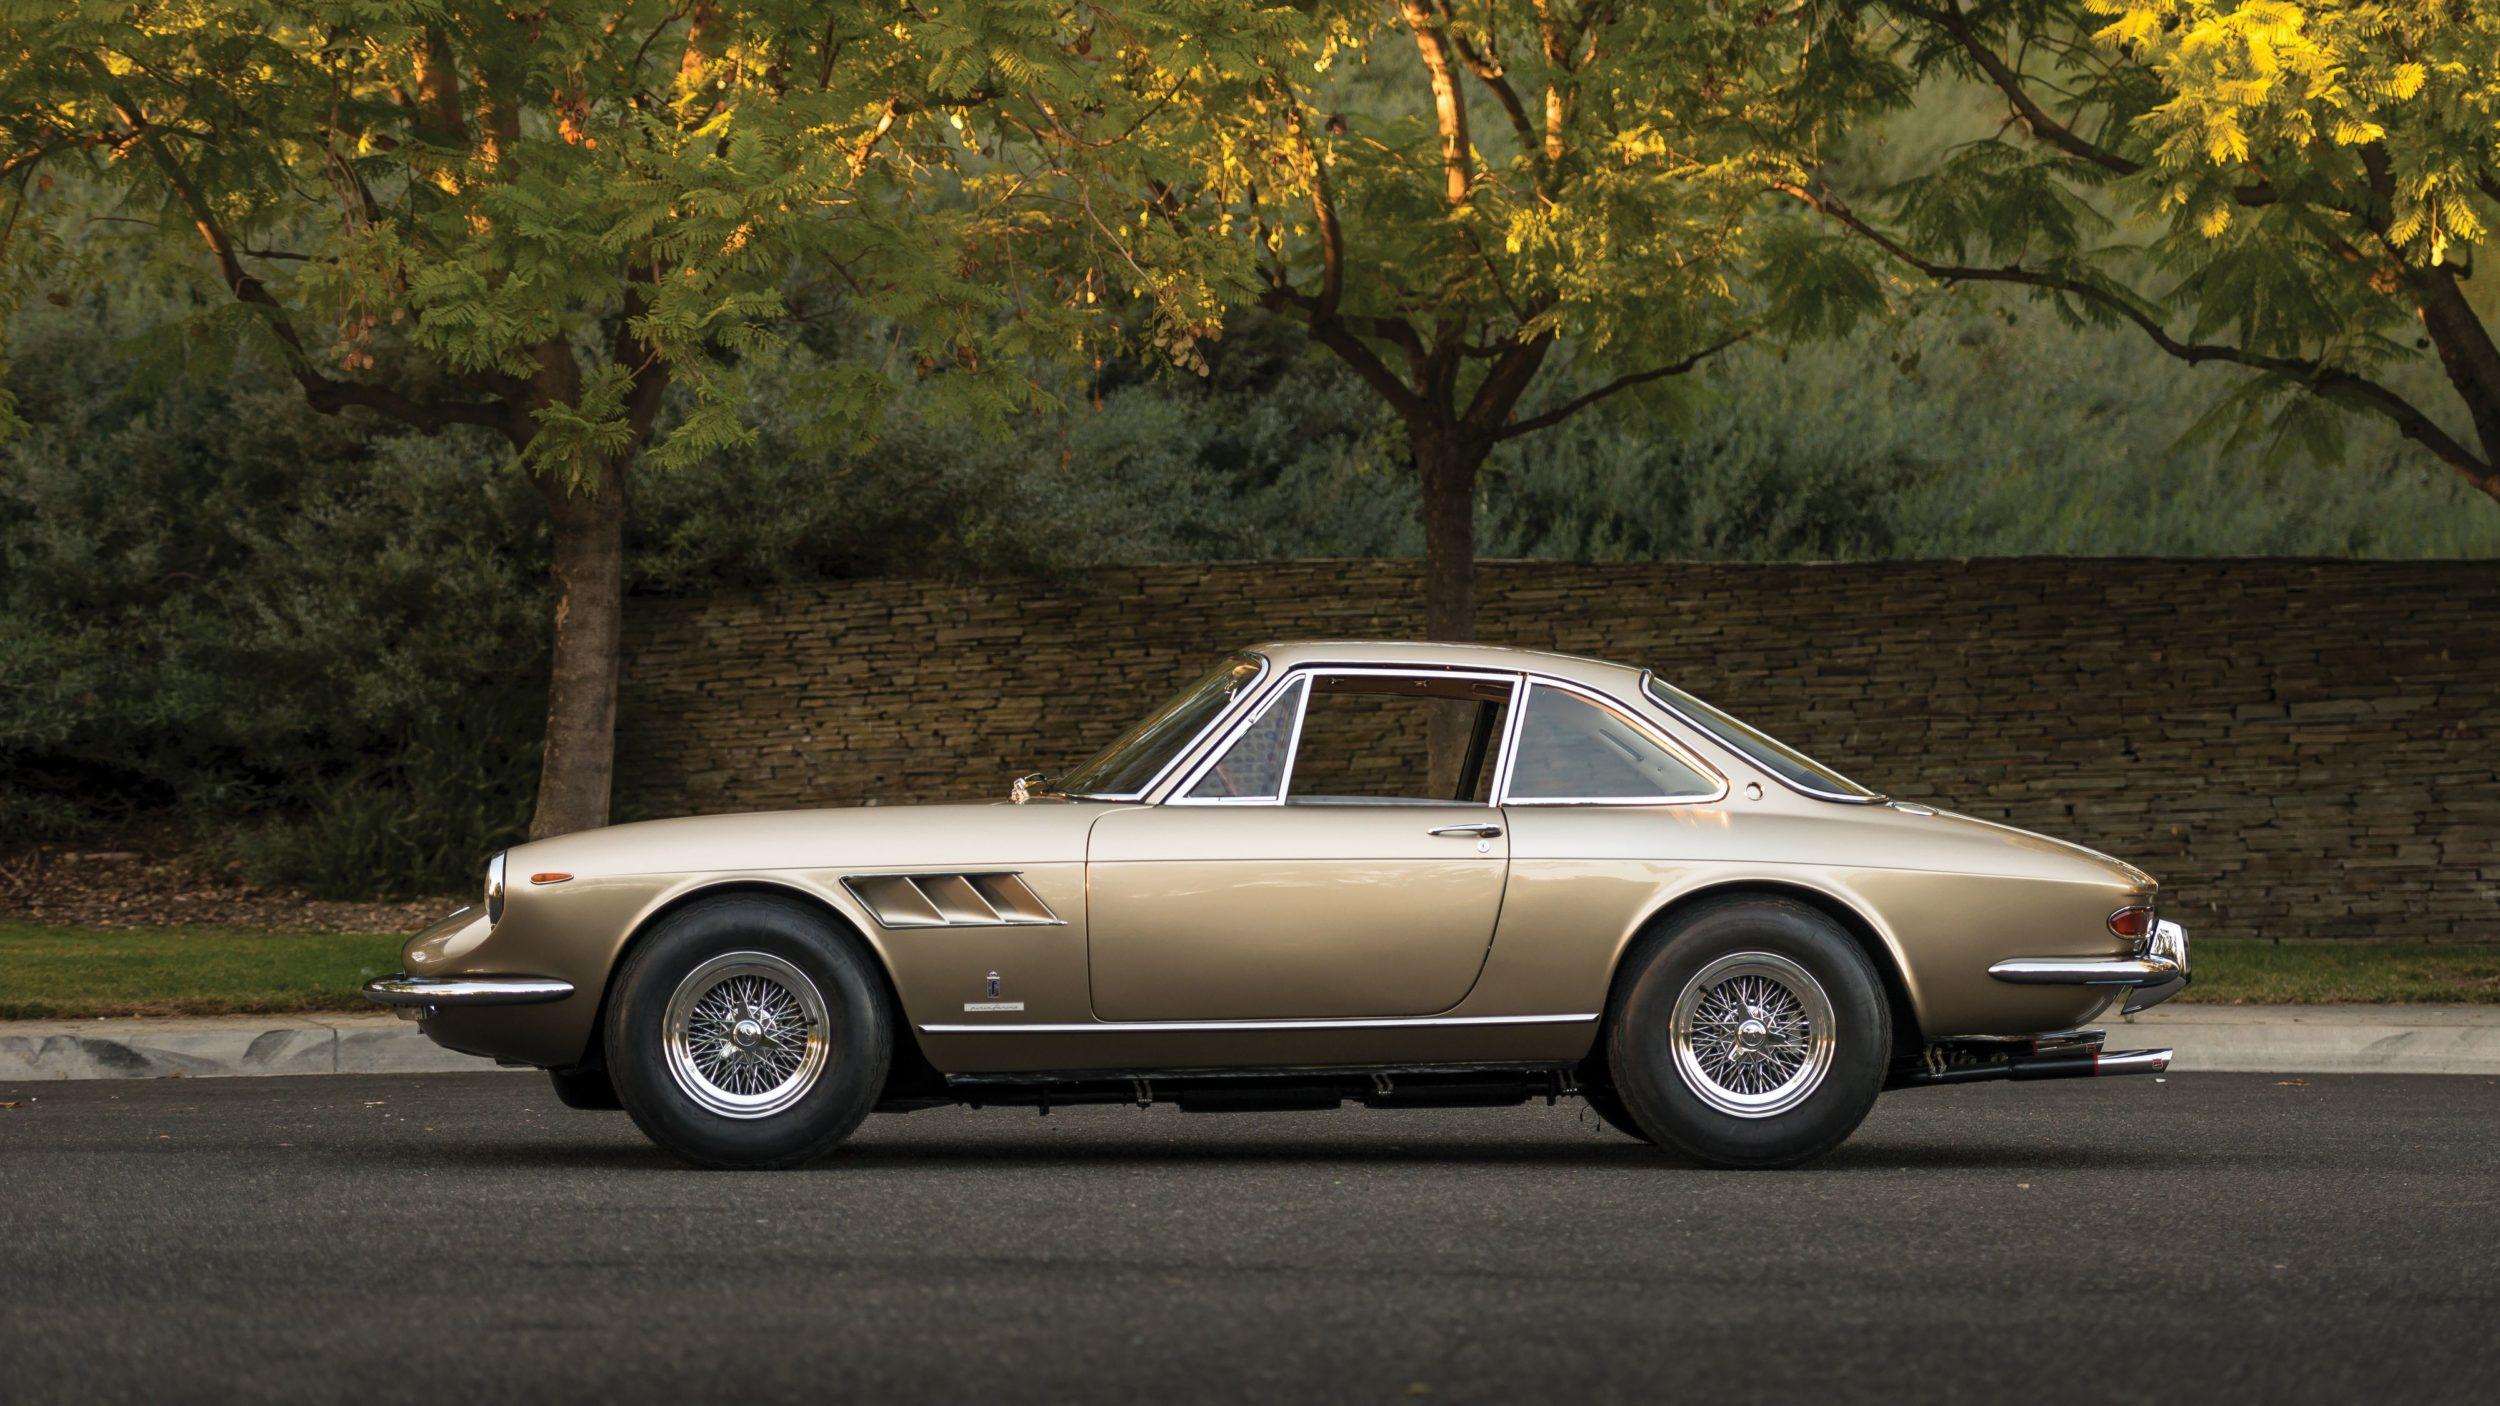 Ten Classic Ferraris More Beautiful Than The 250 Gto Motorwerks Marketing